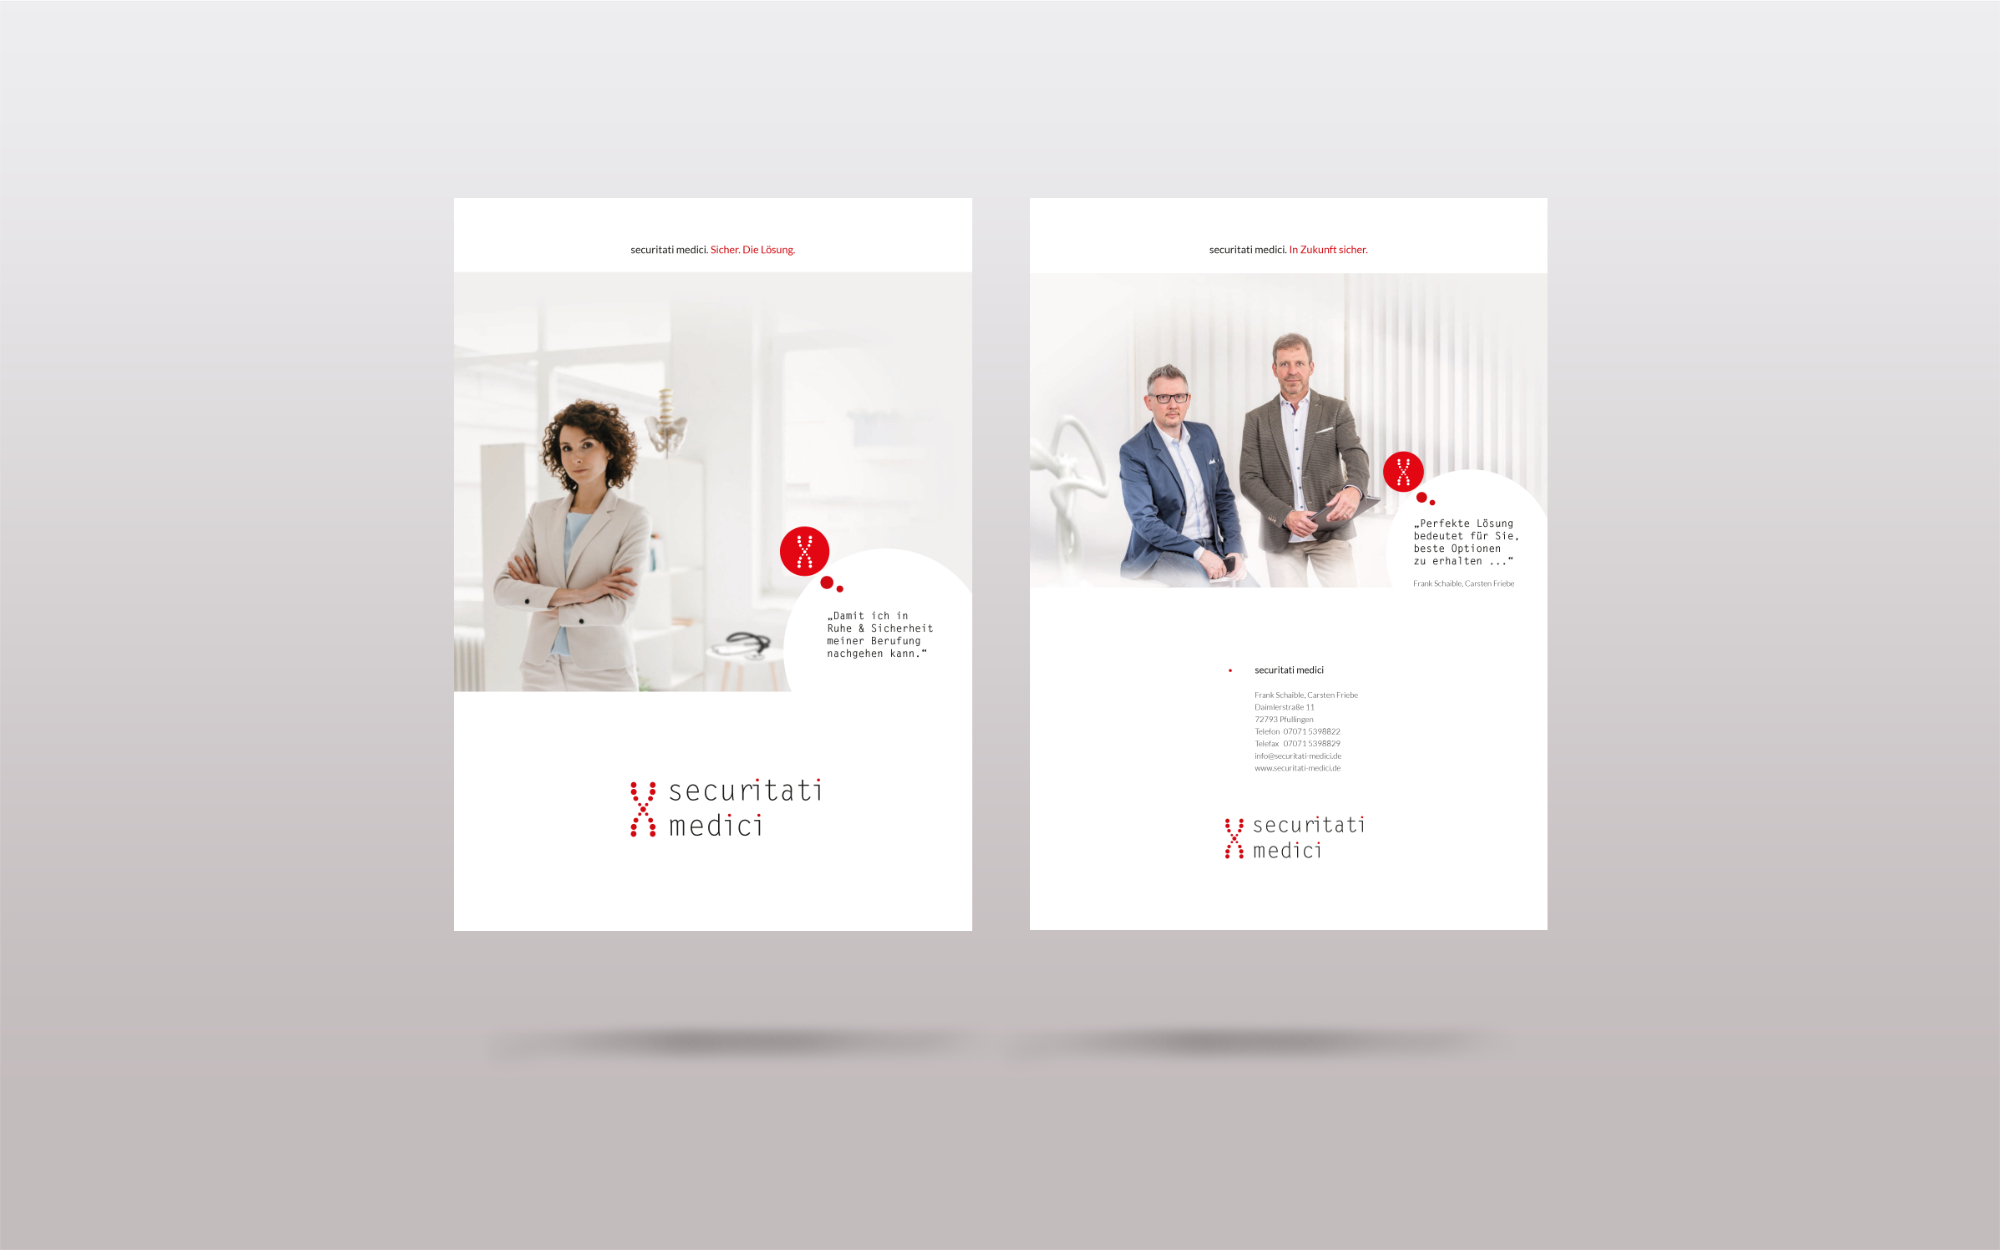 Print - Flyer - securitati medici02